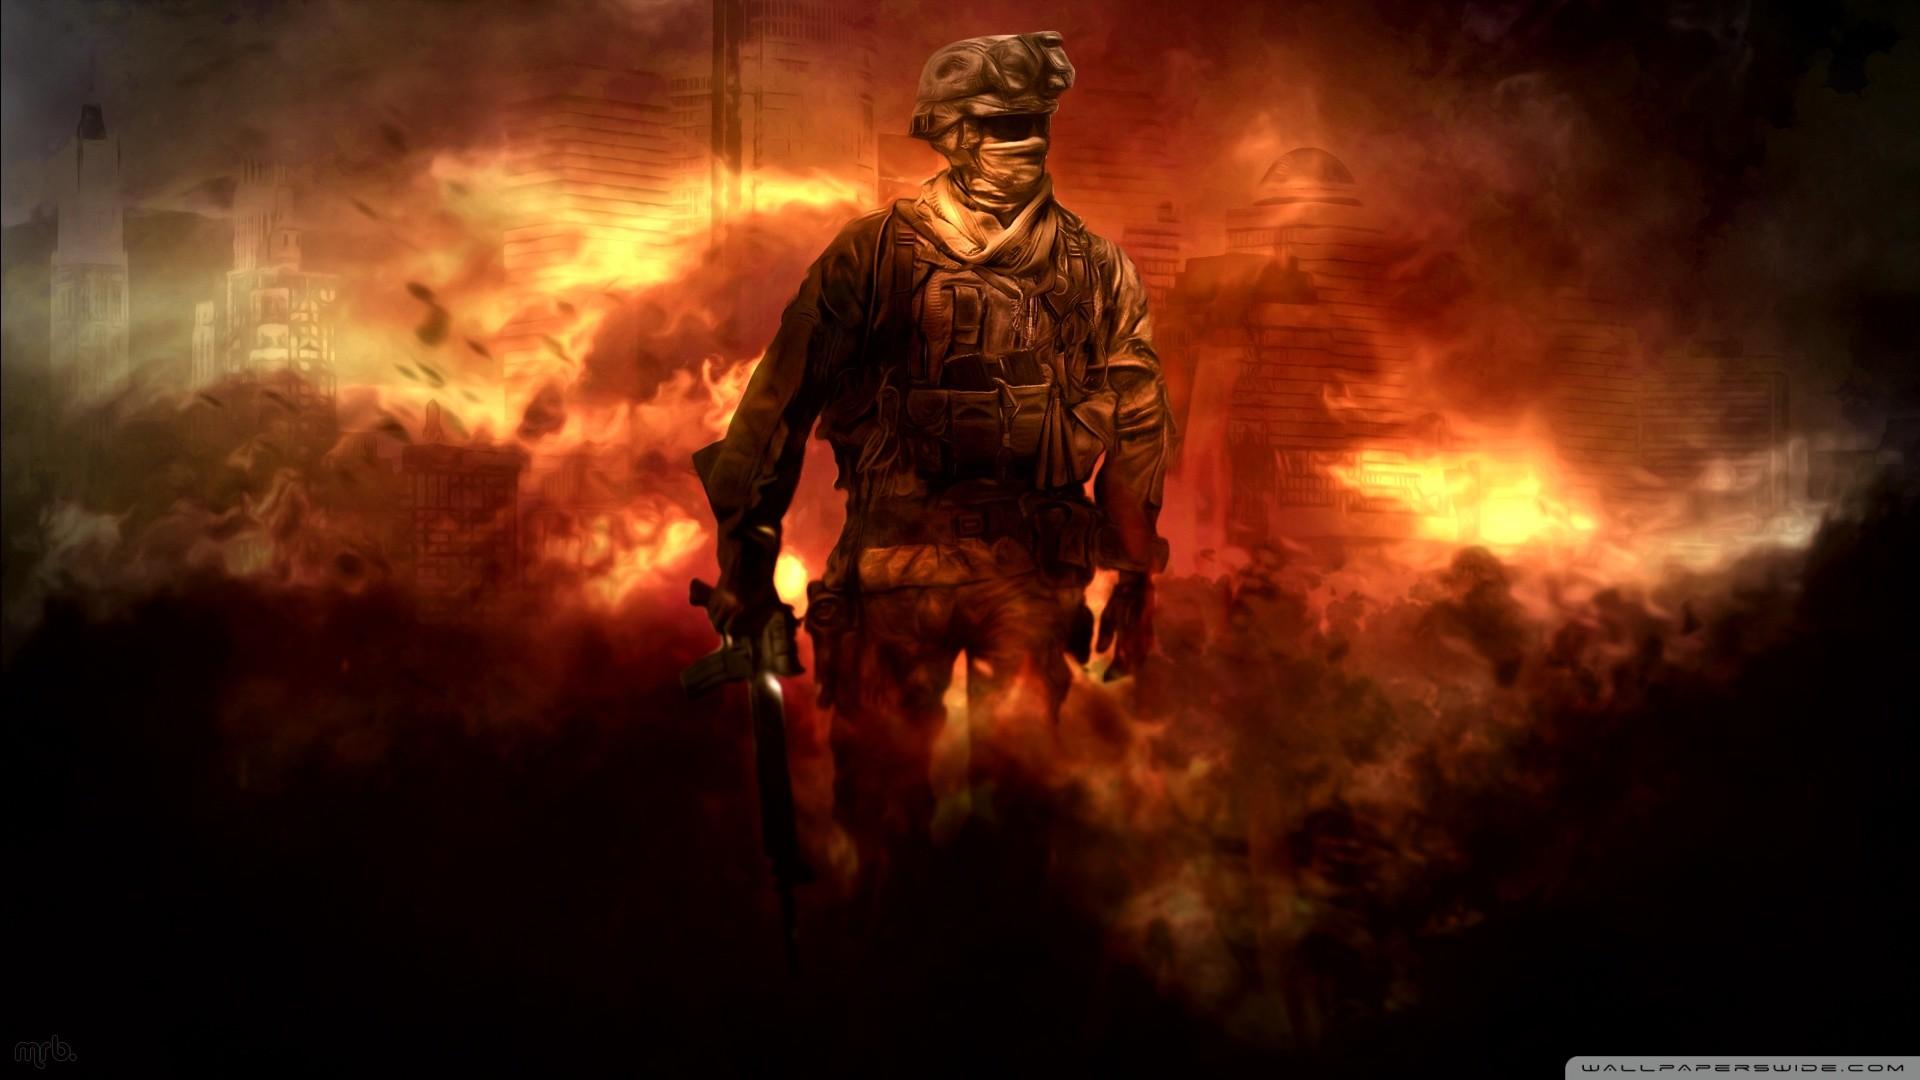 1920x1080 Call Of Duty Mw2 Wallpaper Hd 1080p